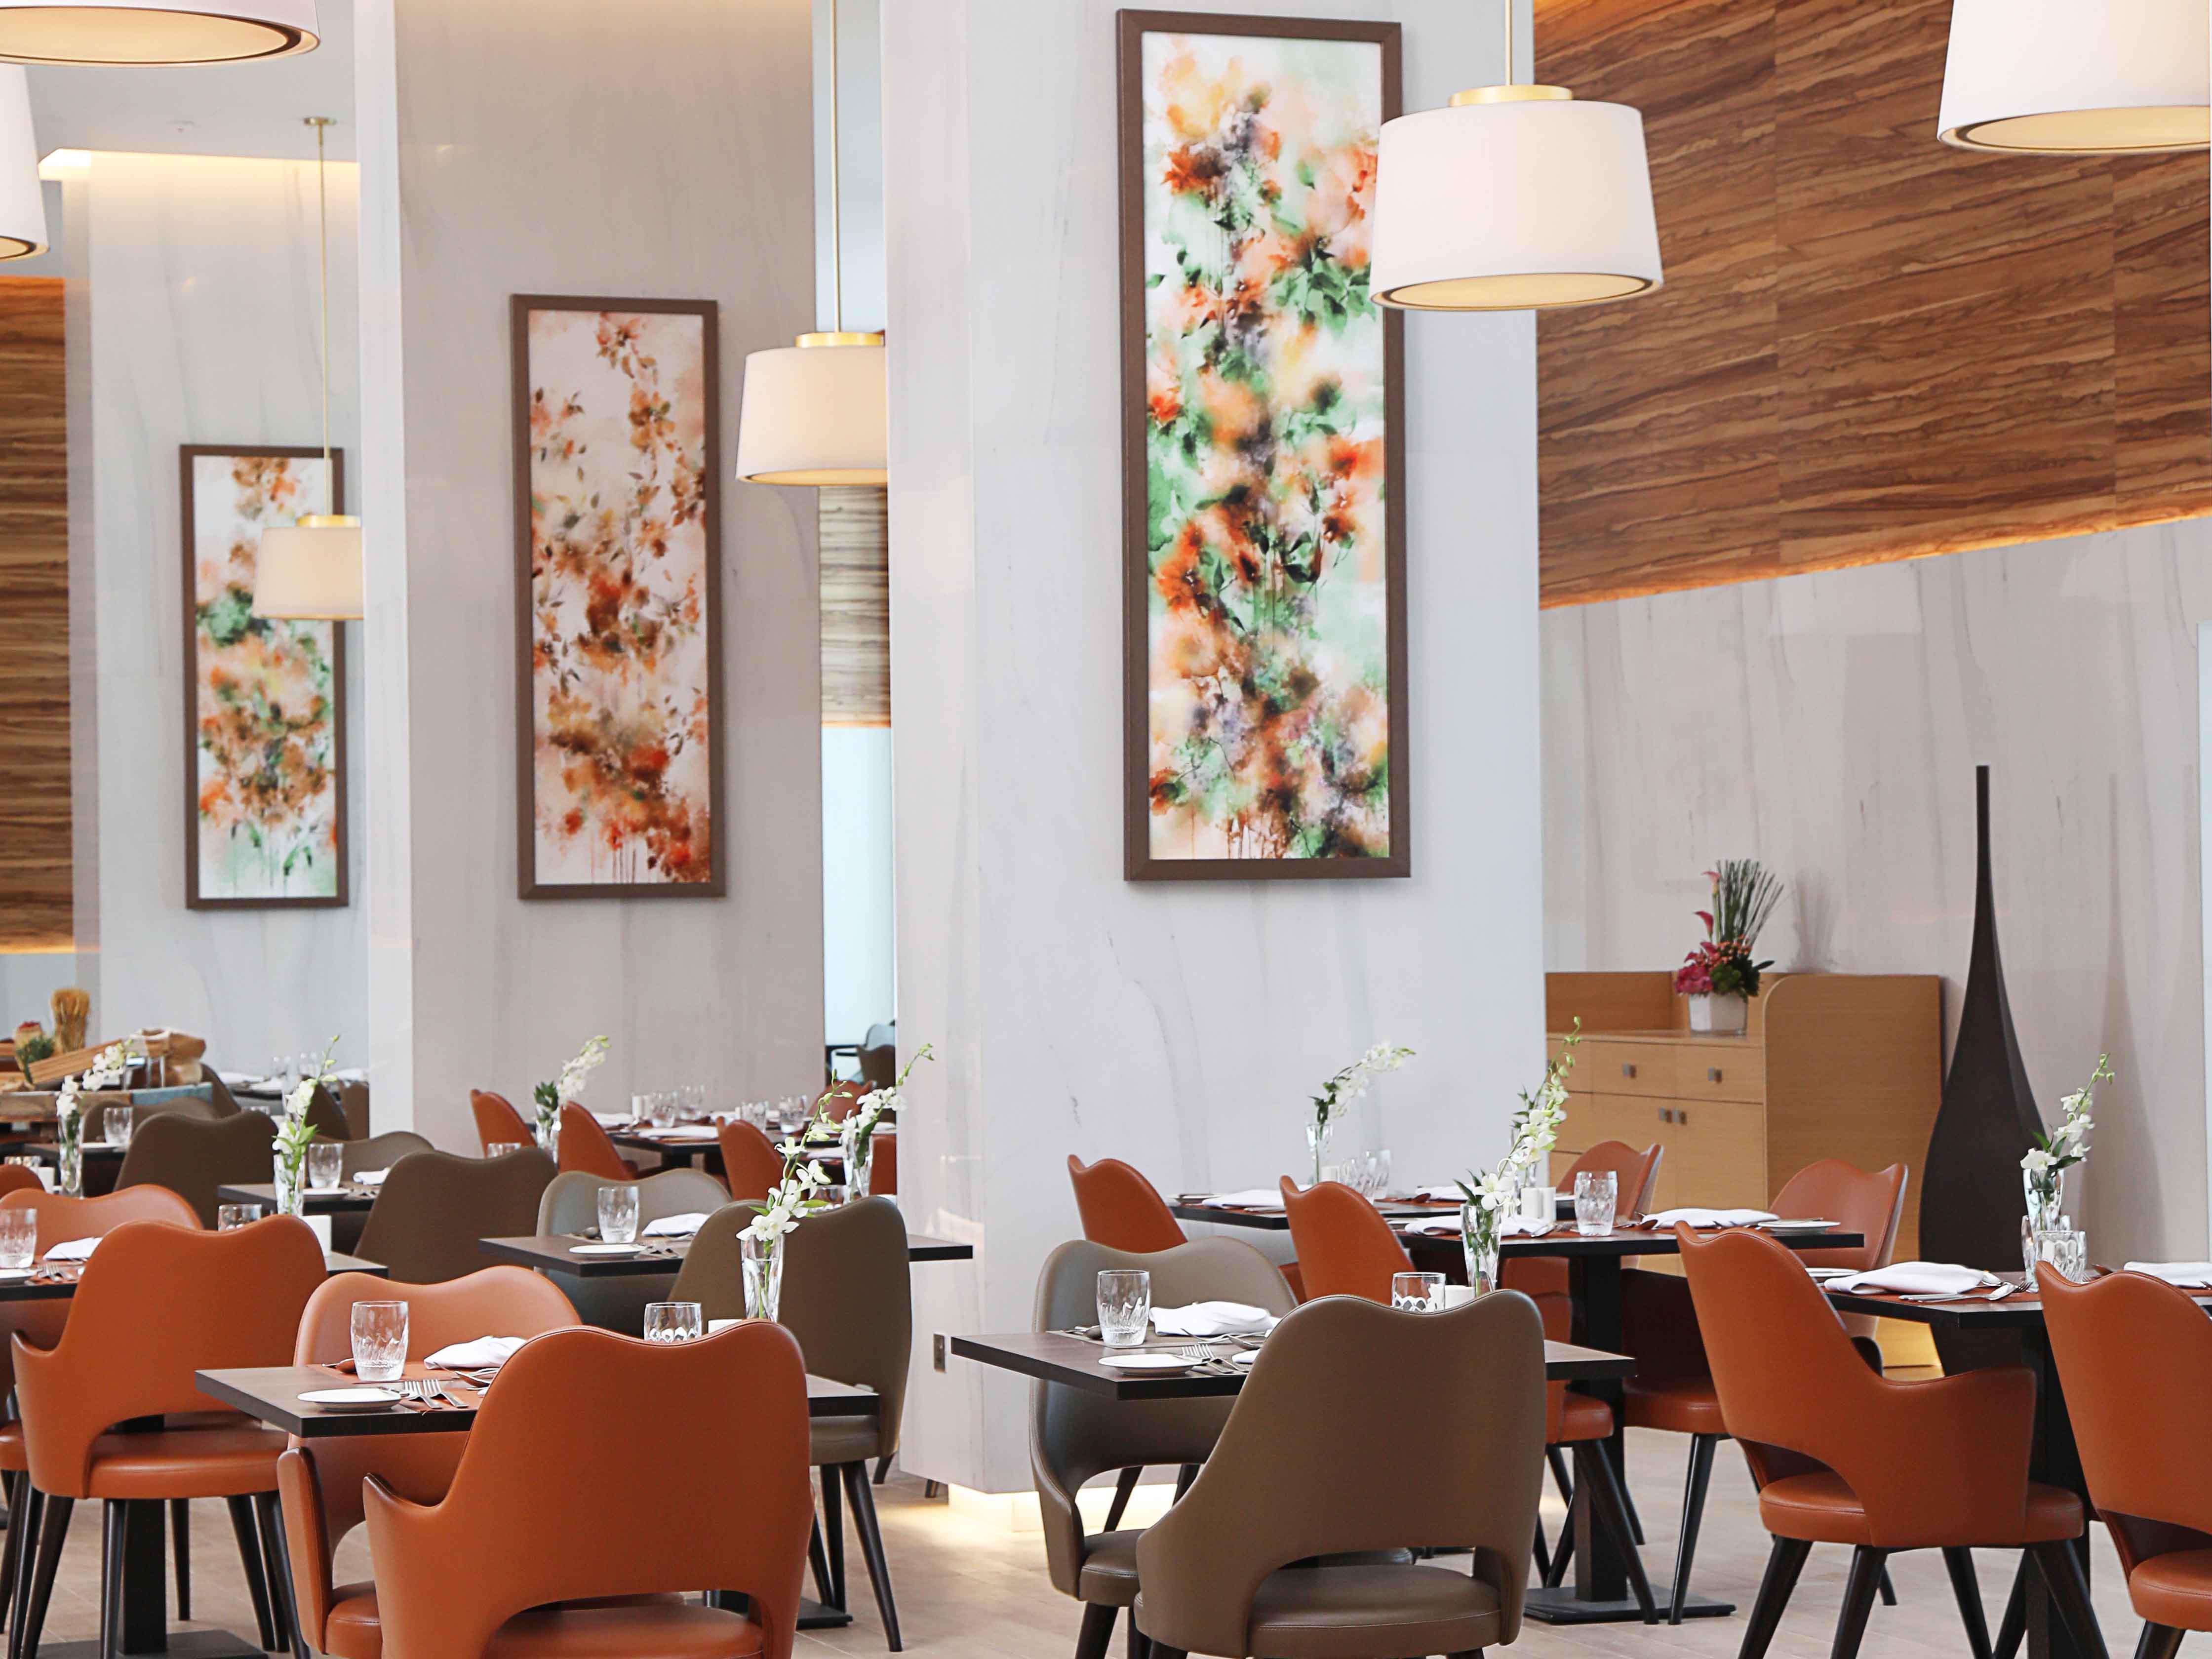 Gardenia Brasserie at Grand Cosmopolitan Hotel in Dubai